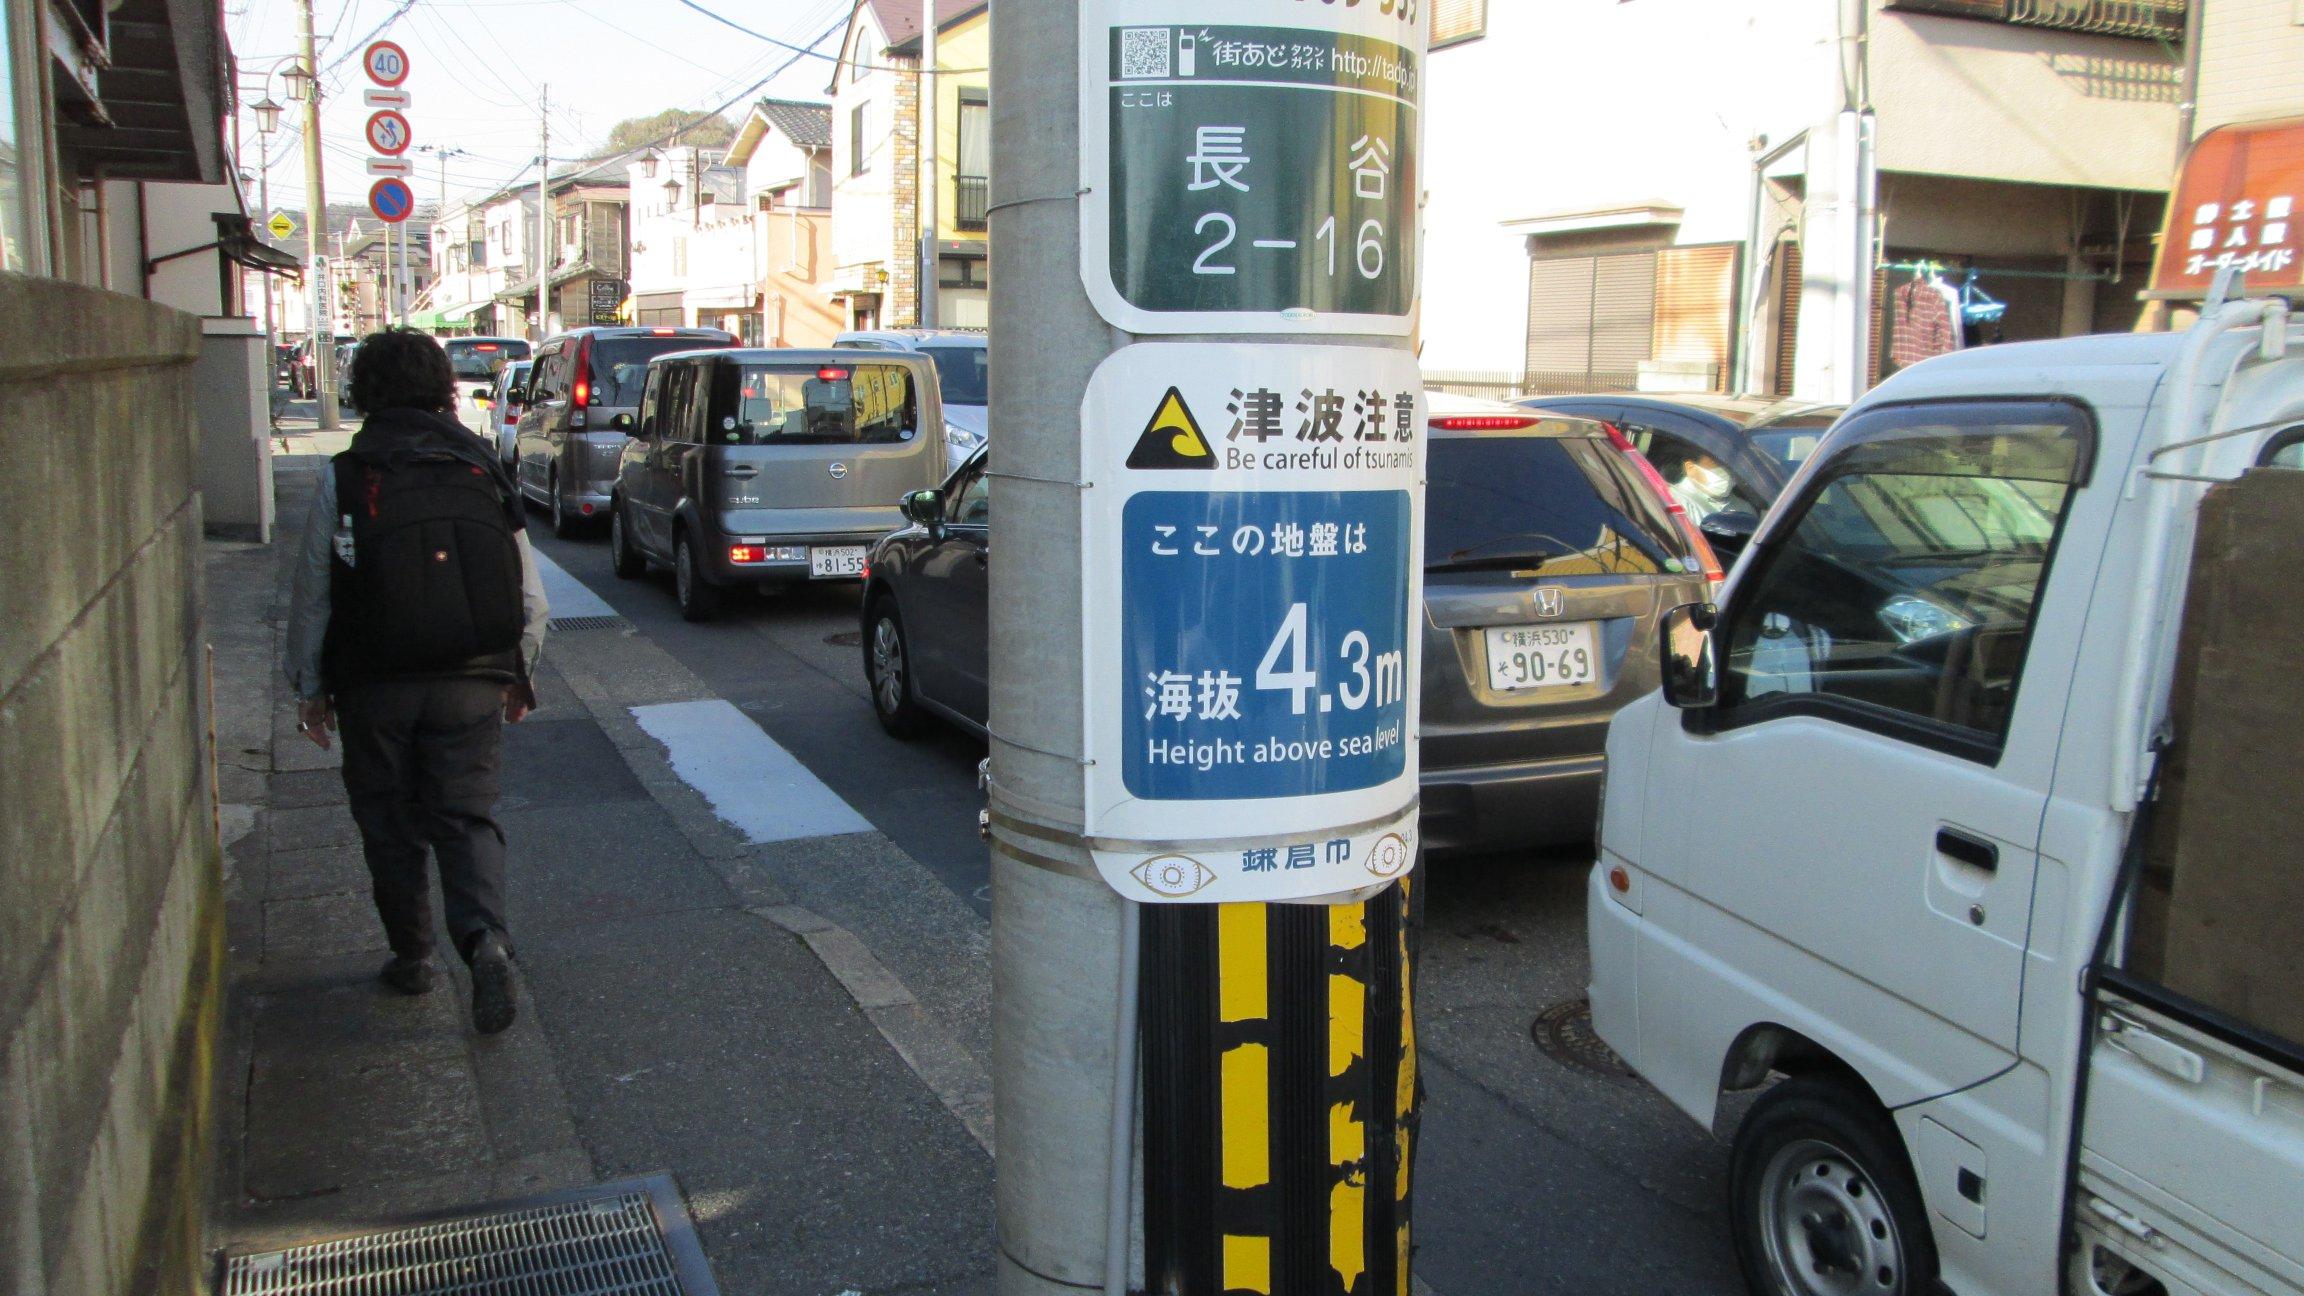 Ruta para visitar Kamakura, Japón